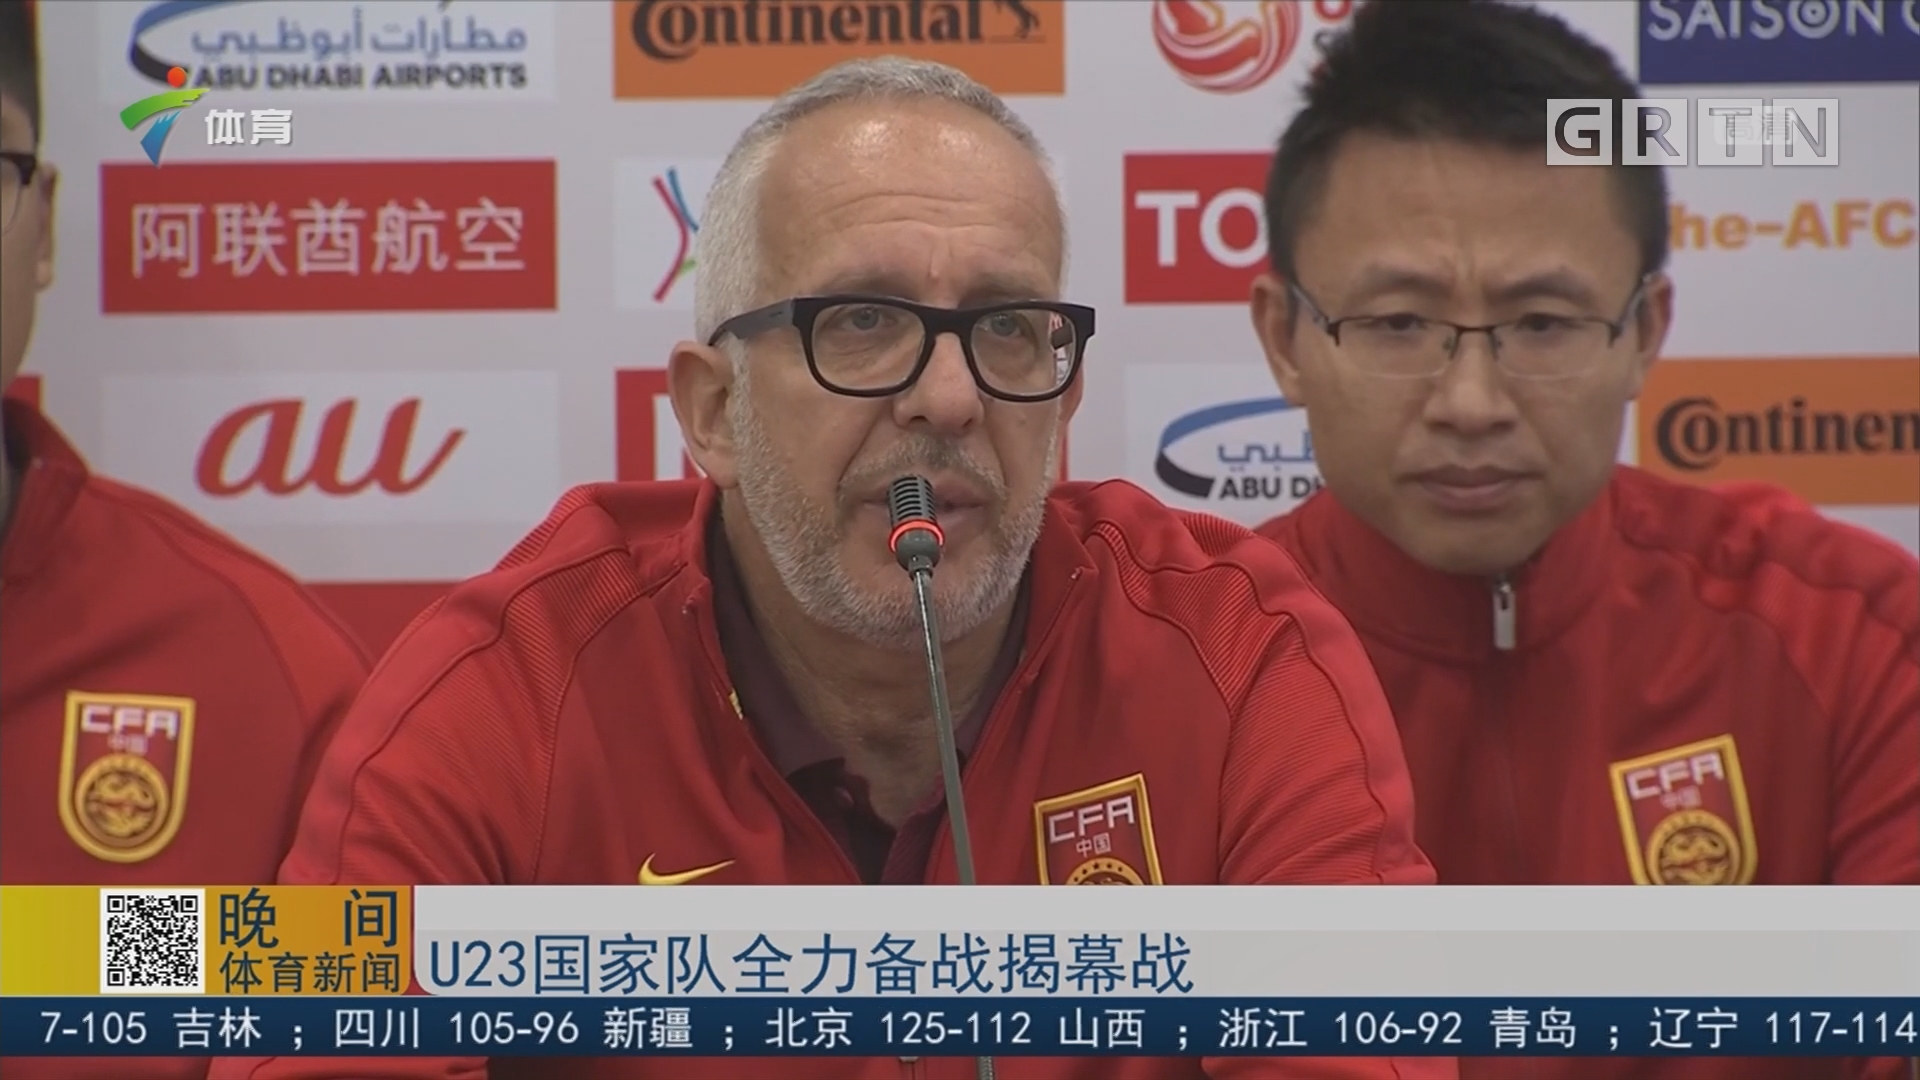 U23国家队全力备战揭幕战